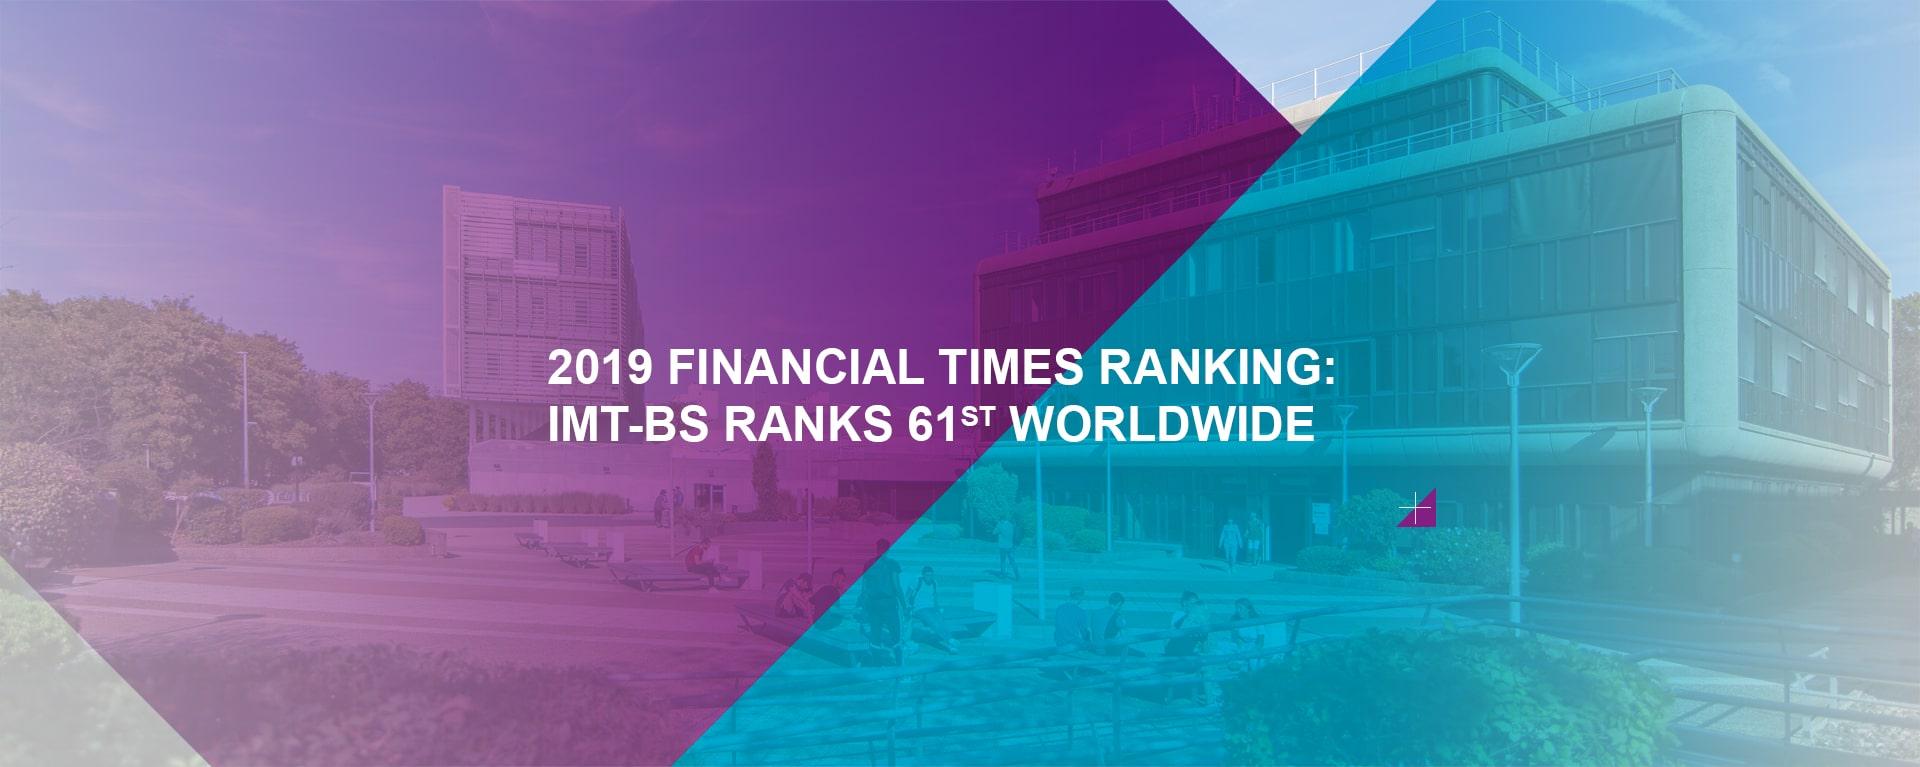 FT Ranking 2019